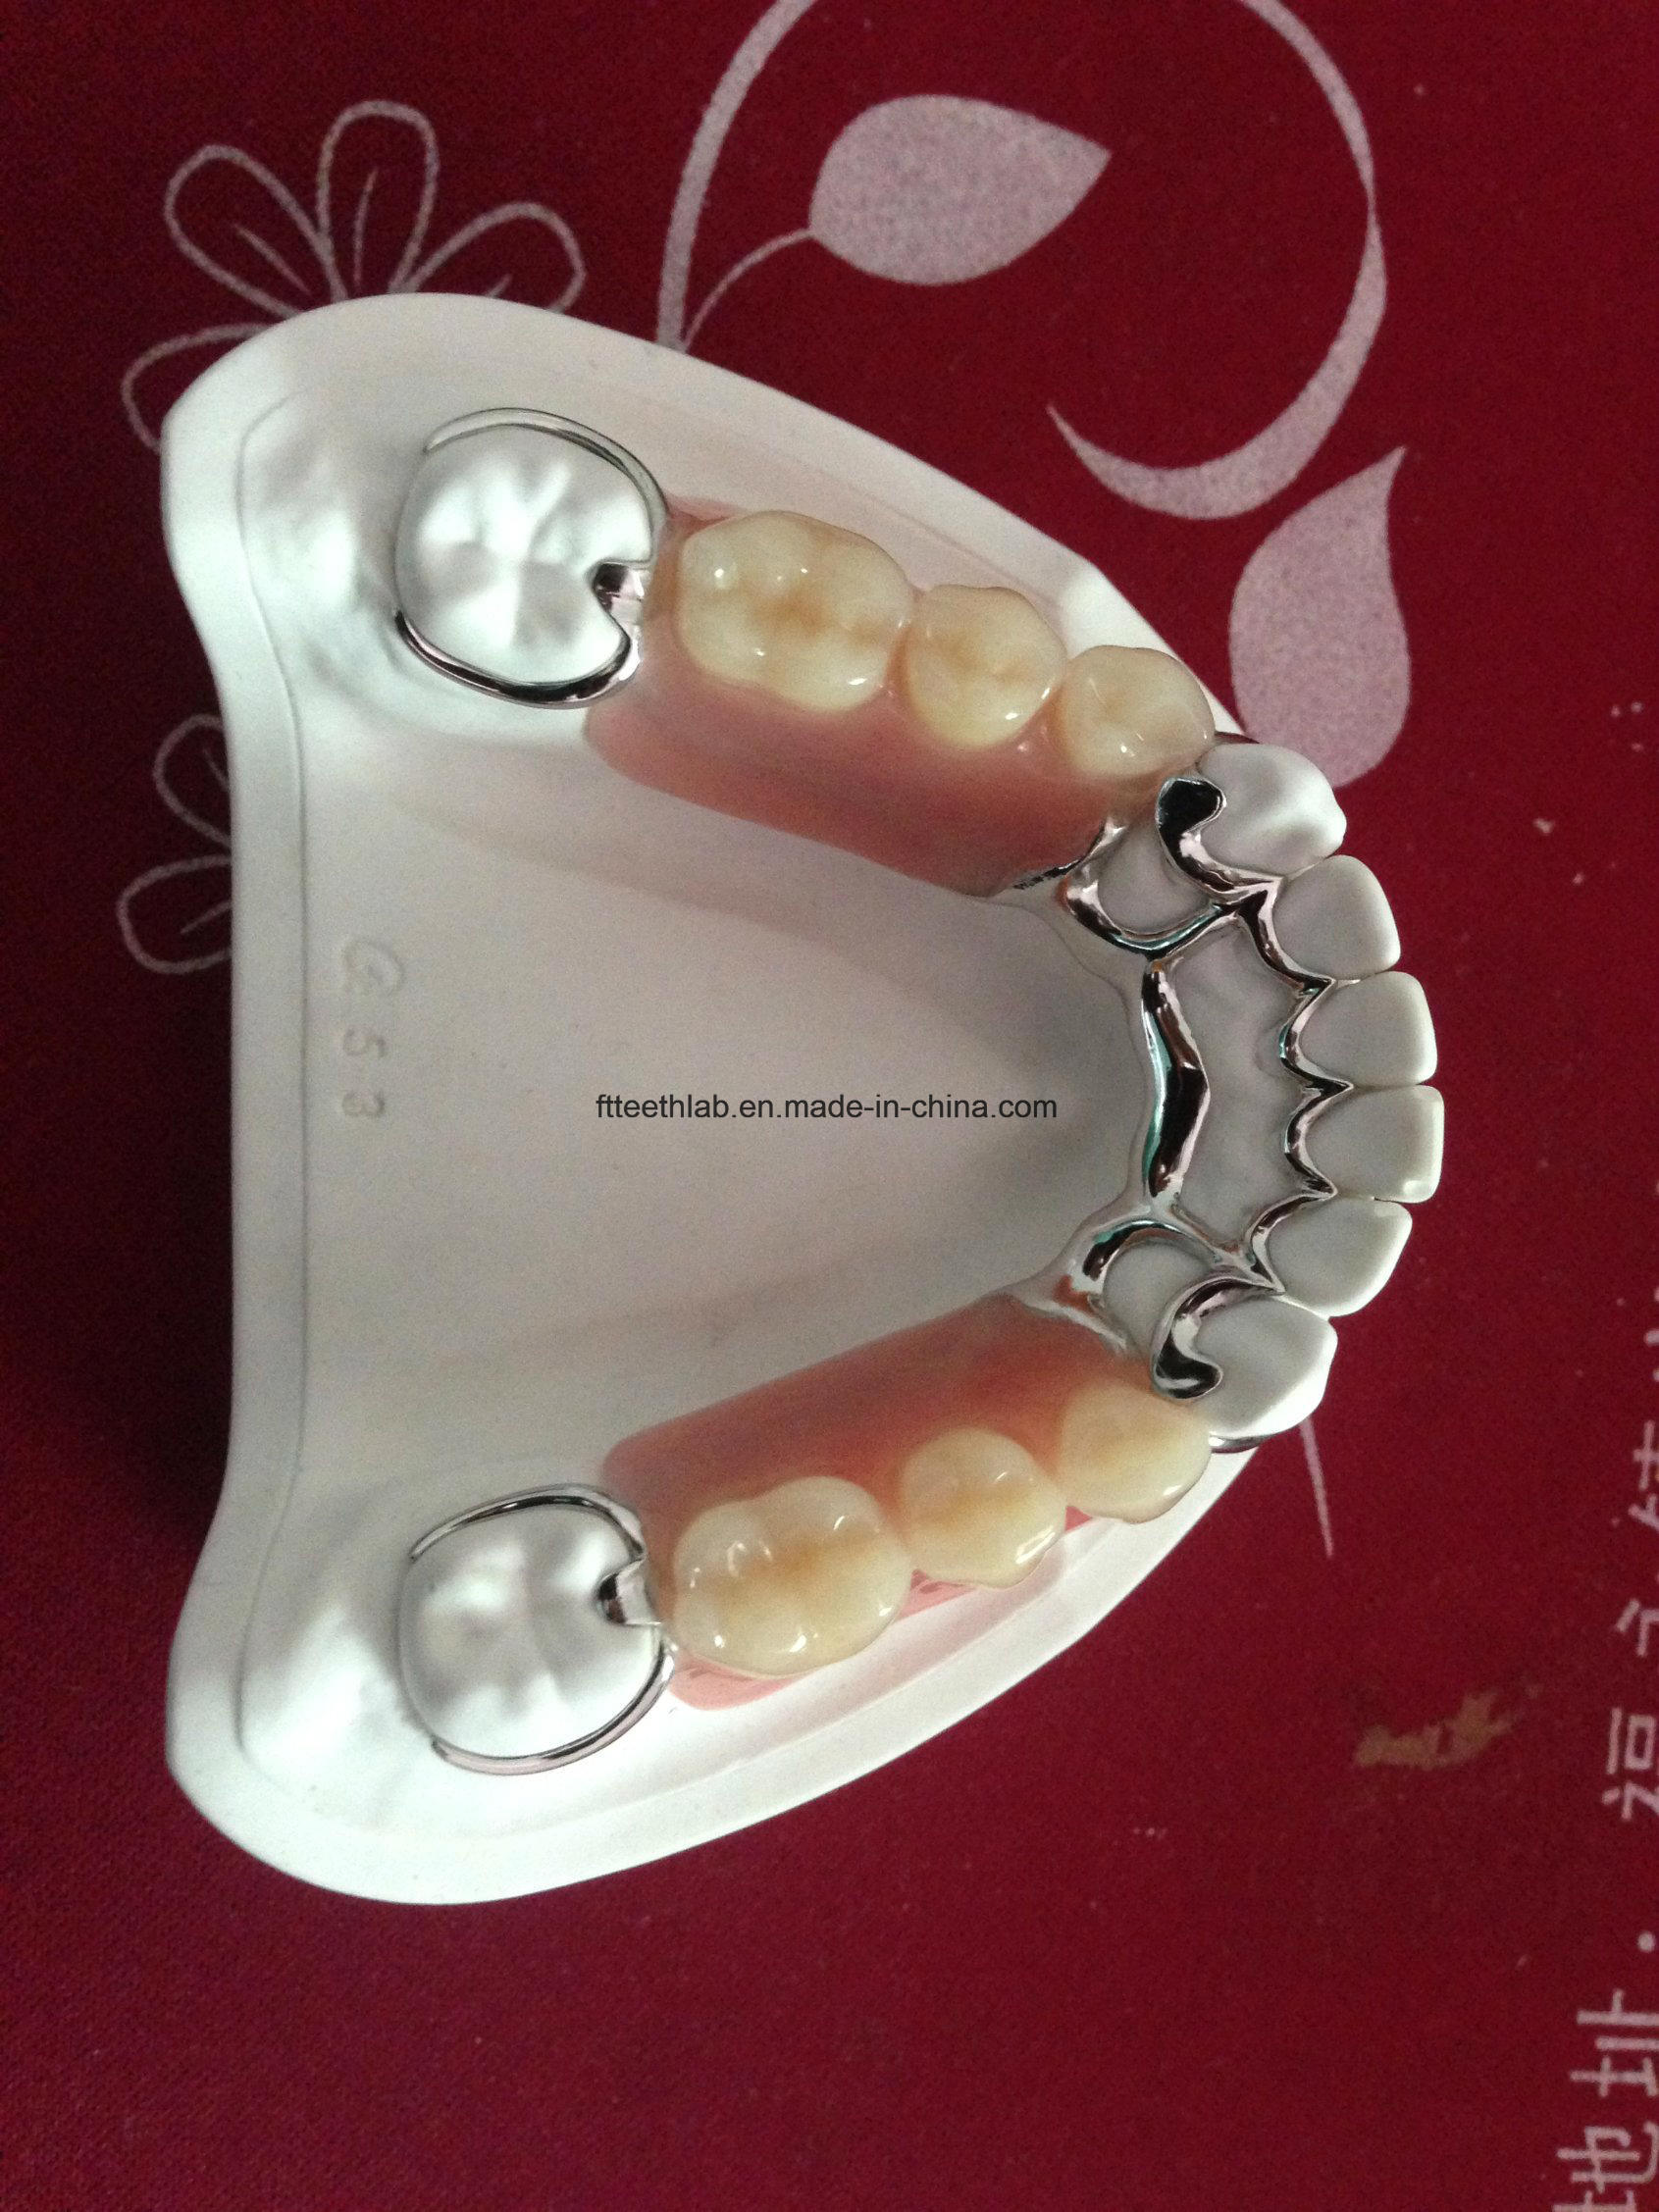 Dental Cobalt Chrome Casting Framework Denture